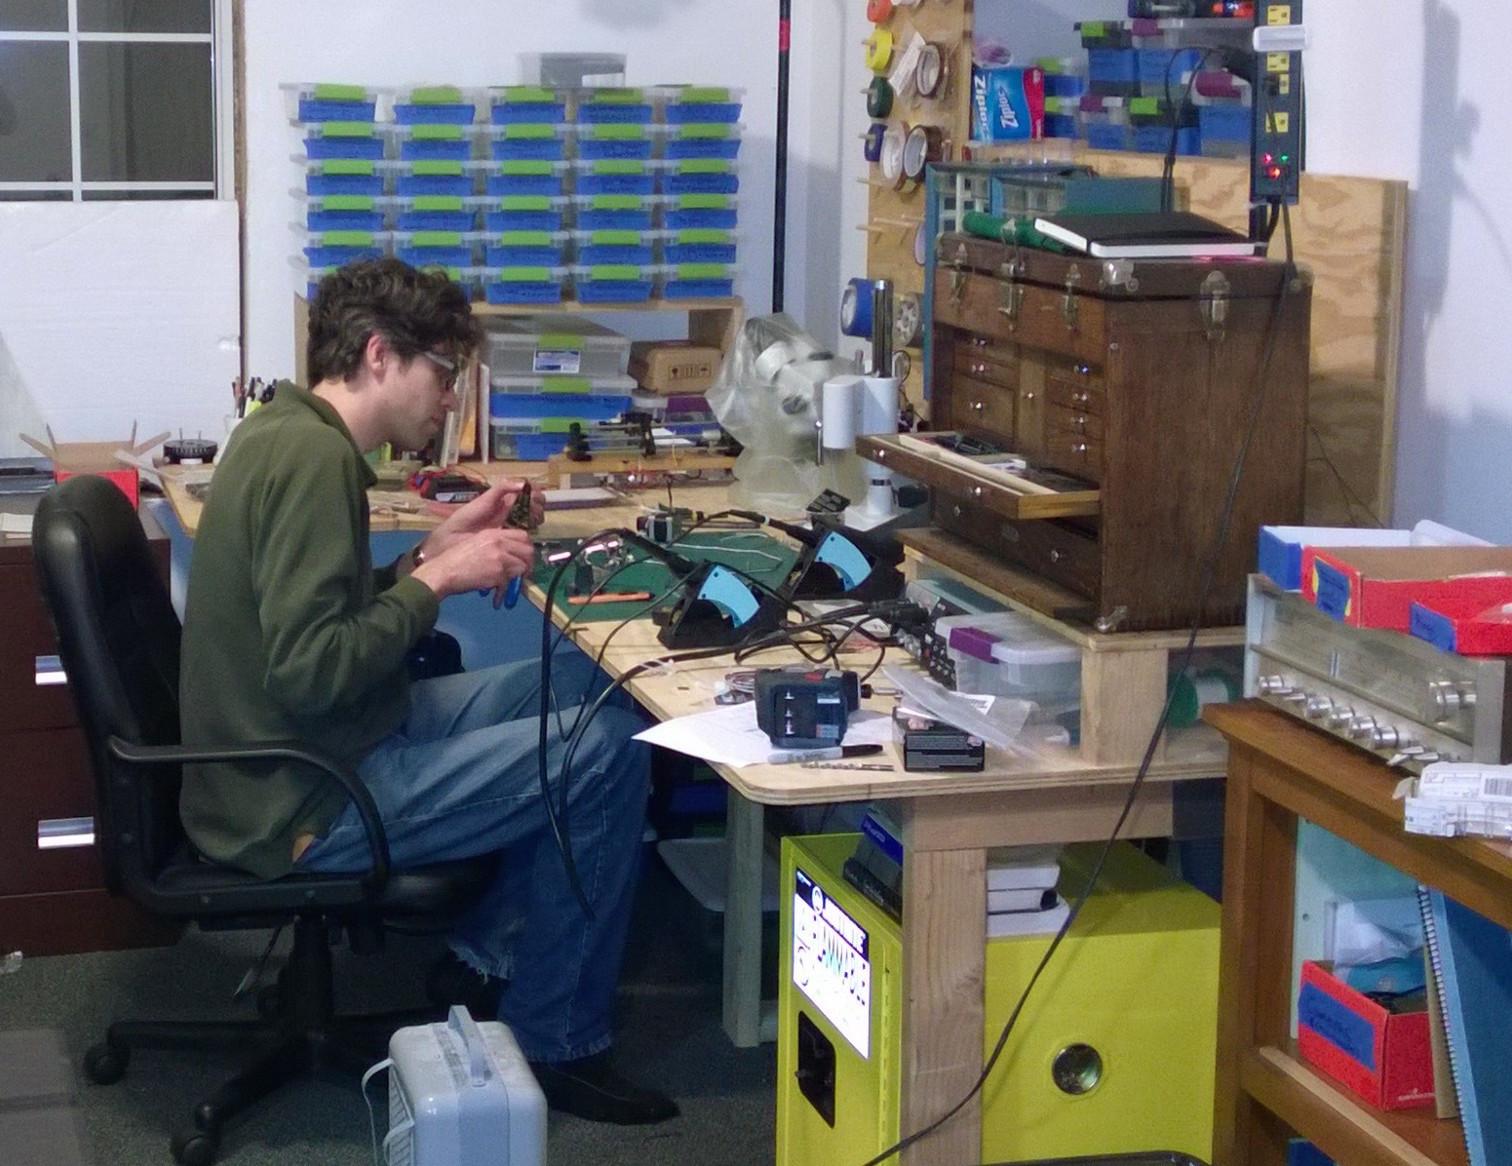 phils_visit_joel_soldering